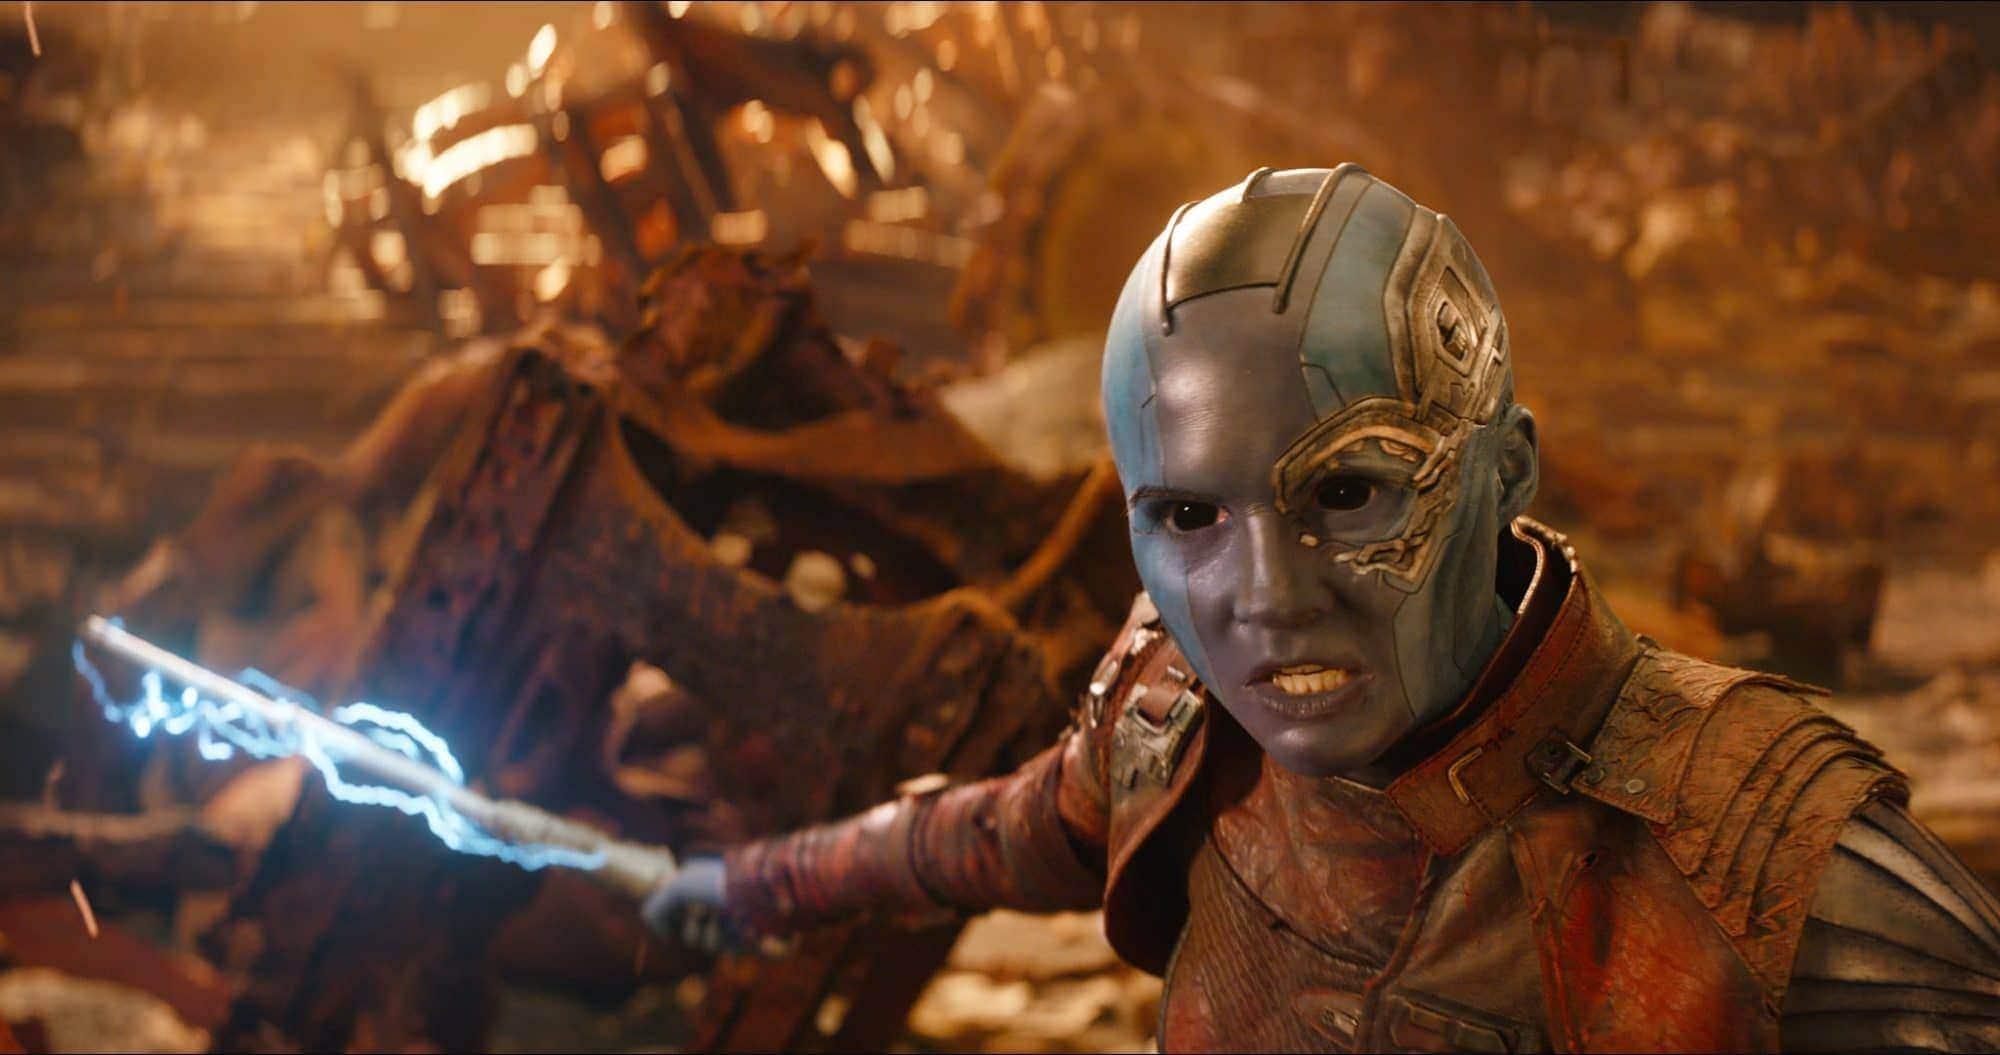 Karen Gillian สาวสุดแซ่บในบท Nebula จาก Guardians of The Galaxy 2